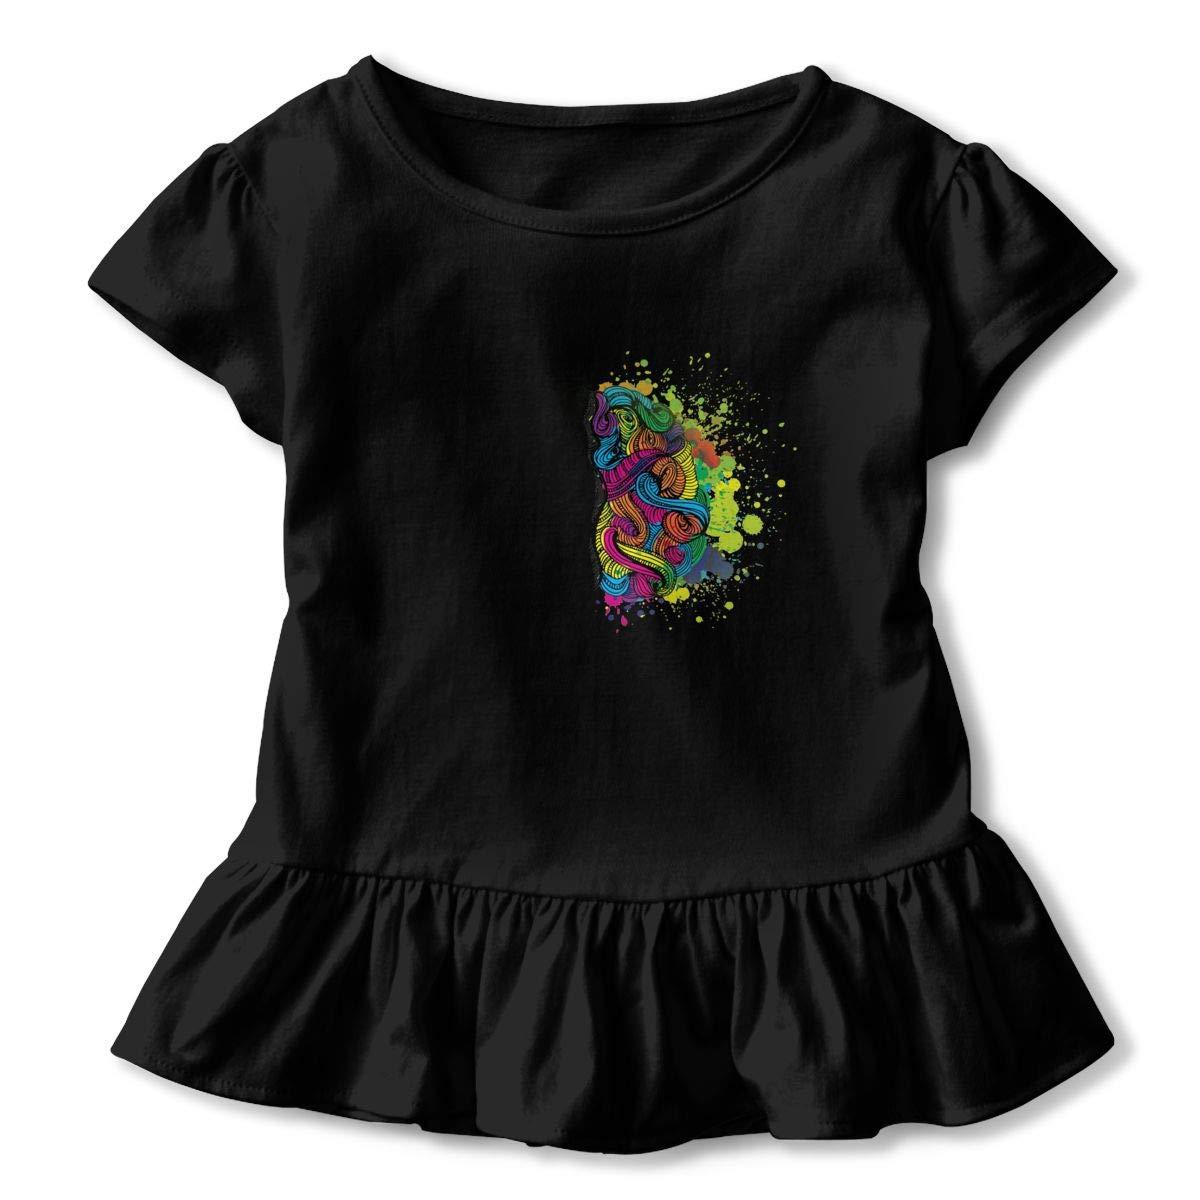 CZnuen Watercolor Math Brain Creativity Baby Girls Basic Short Puff Sleeve Round Neck Ruffle T-Shirt